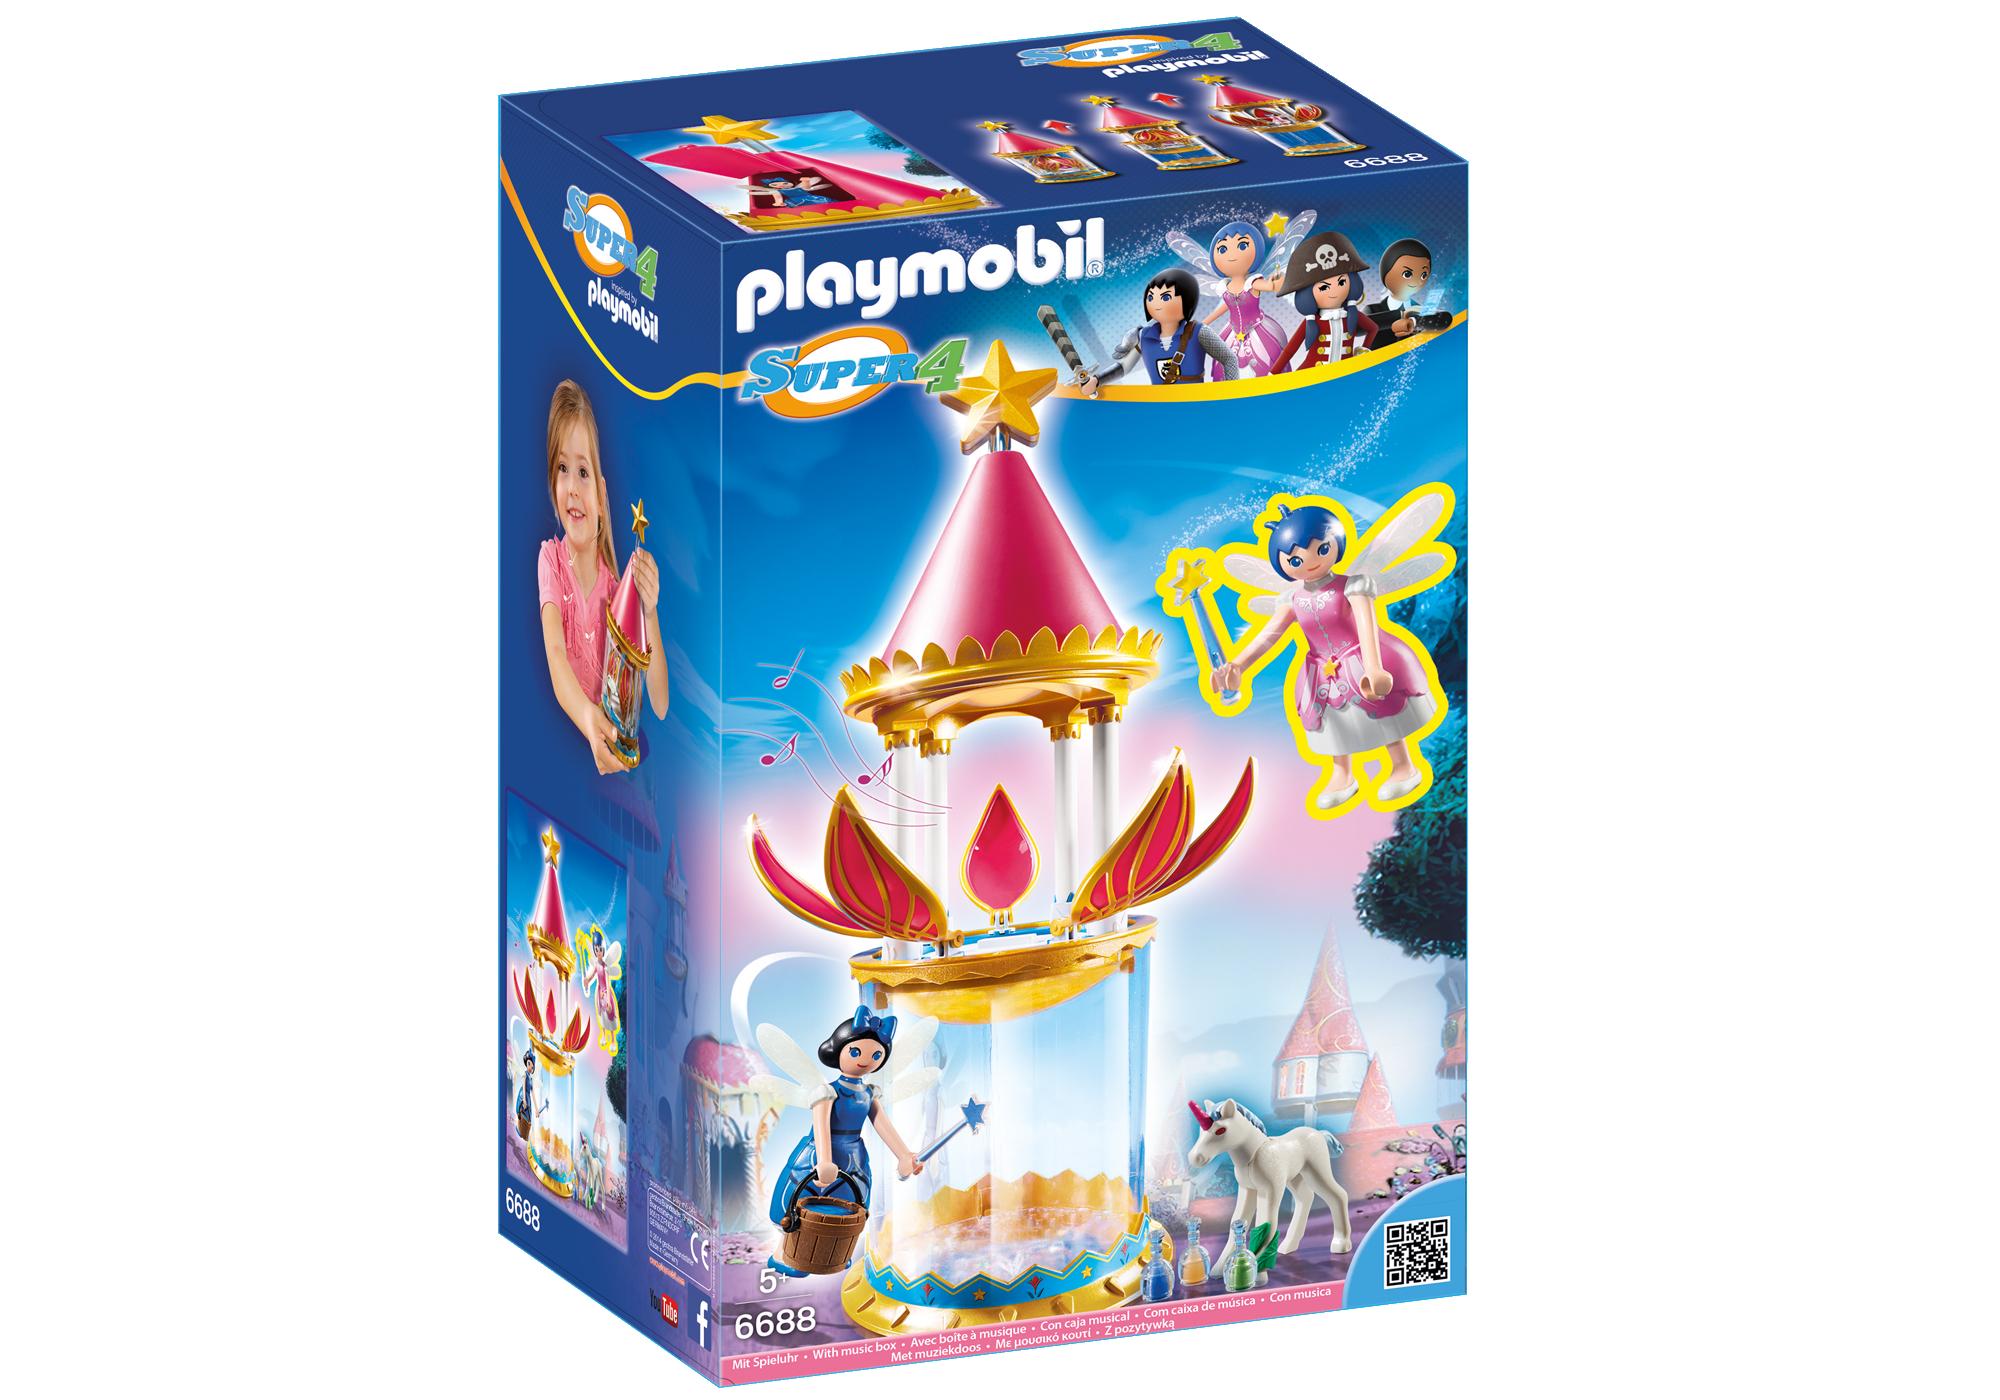 http://media.playmobil.com/i/playmobil/6688_product_box_front